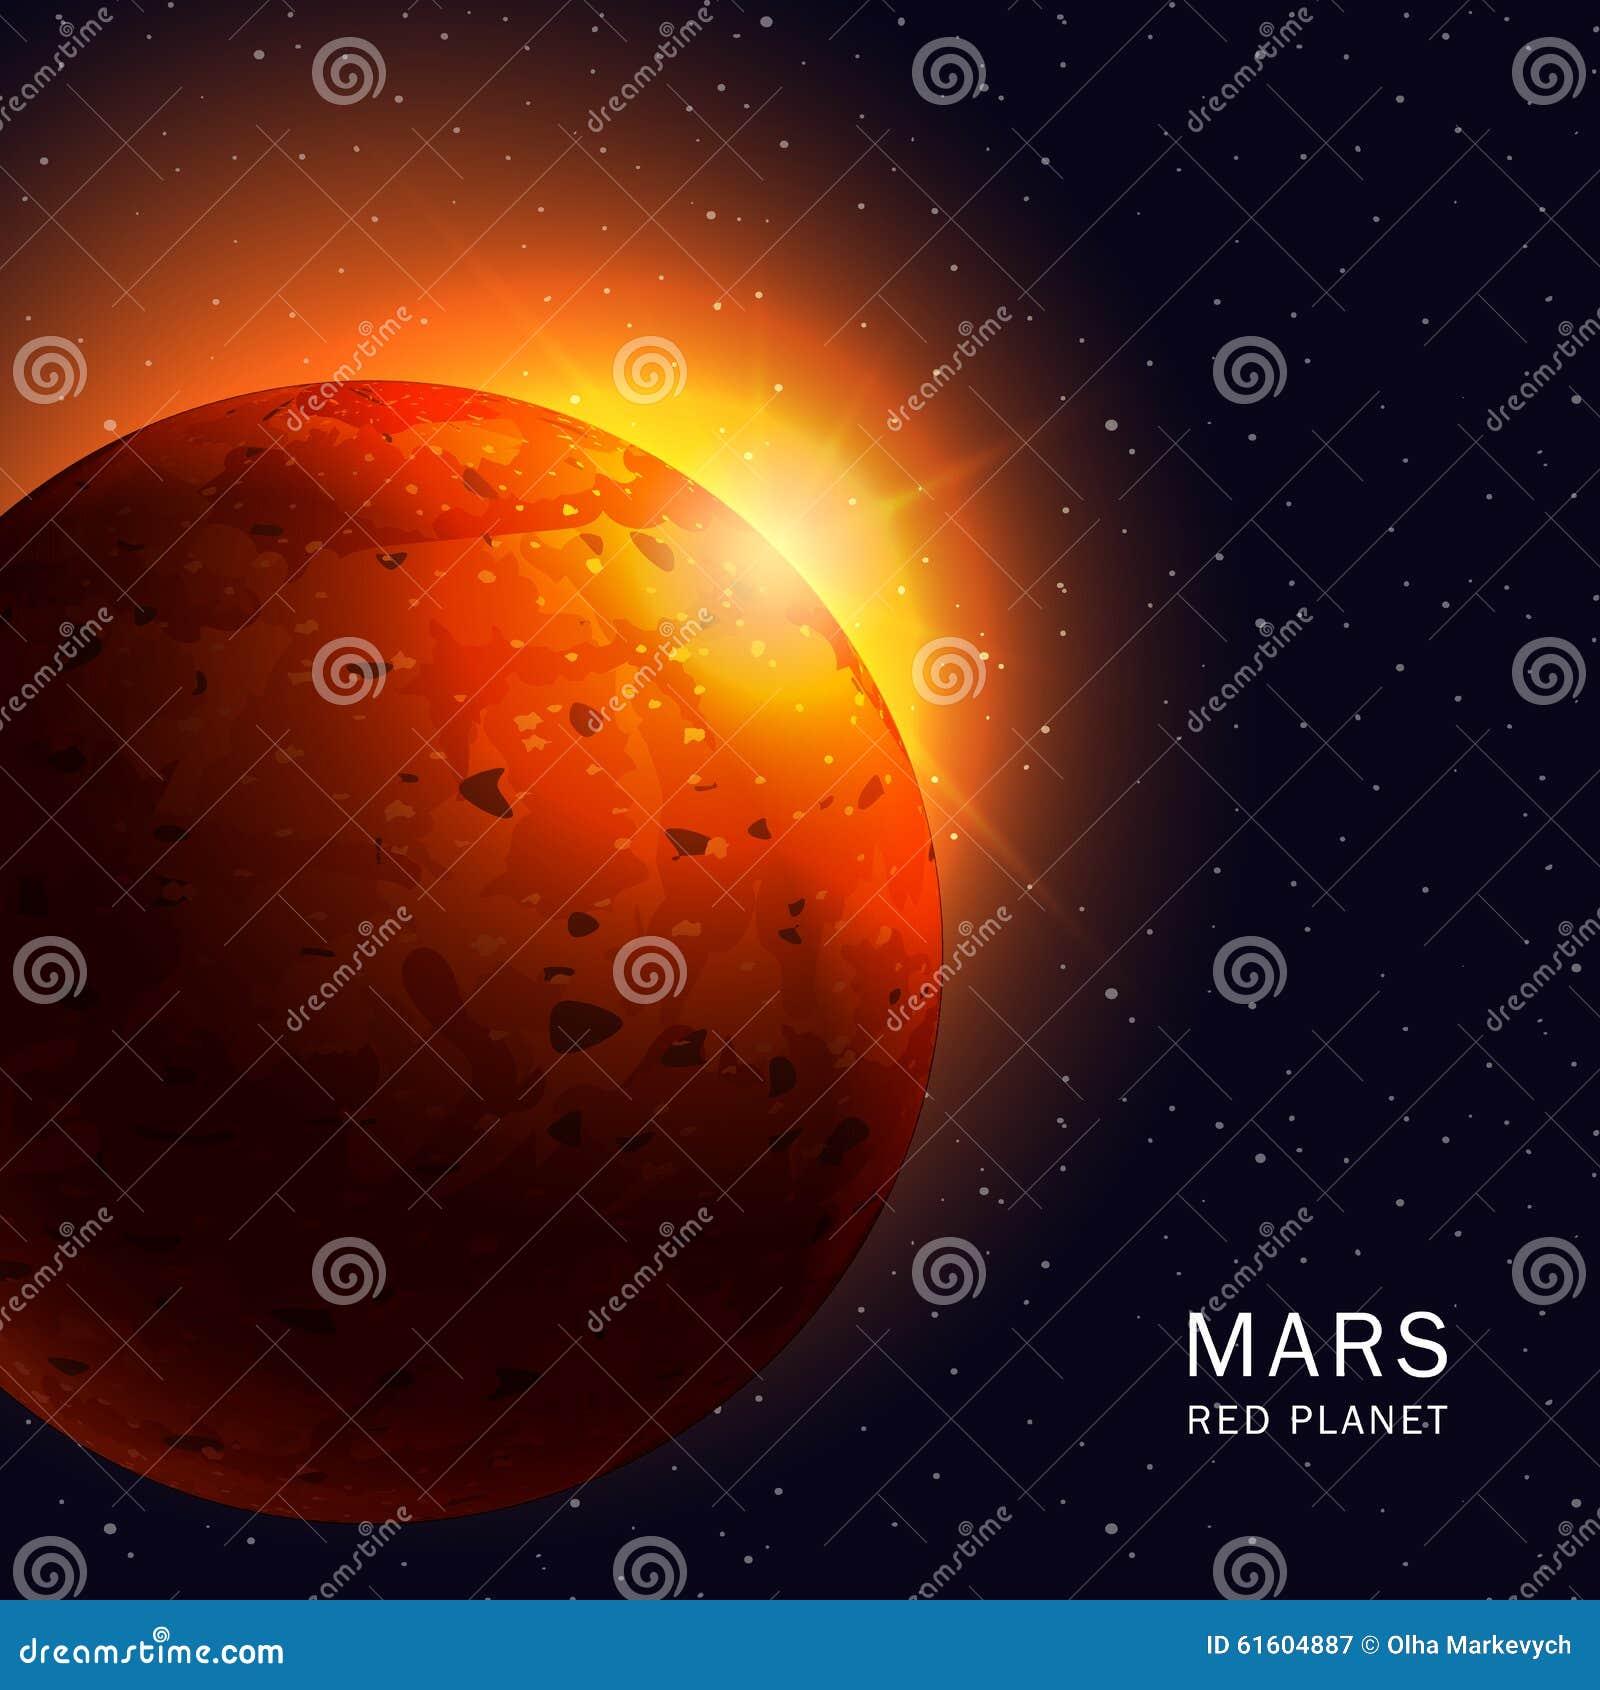 mars planet vector - photo #37